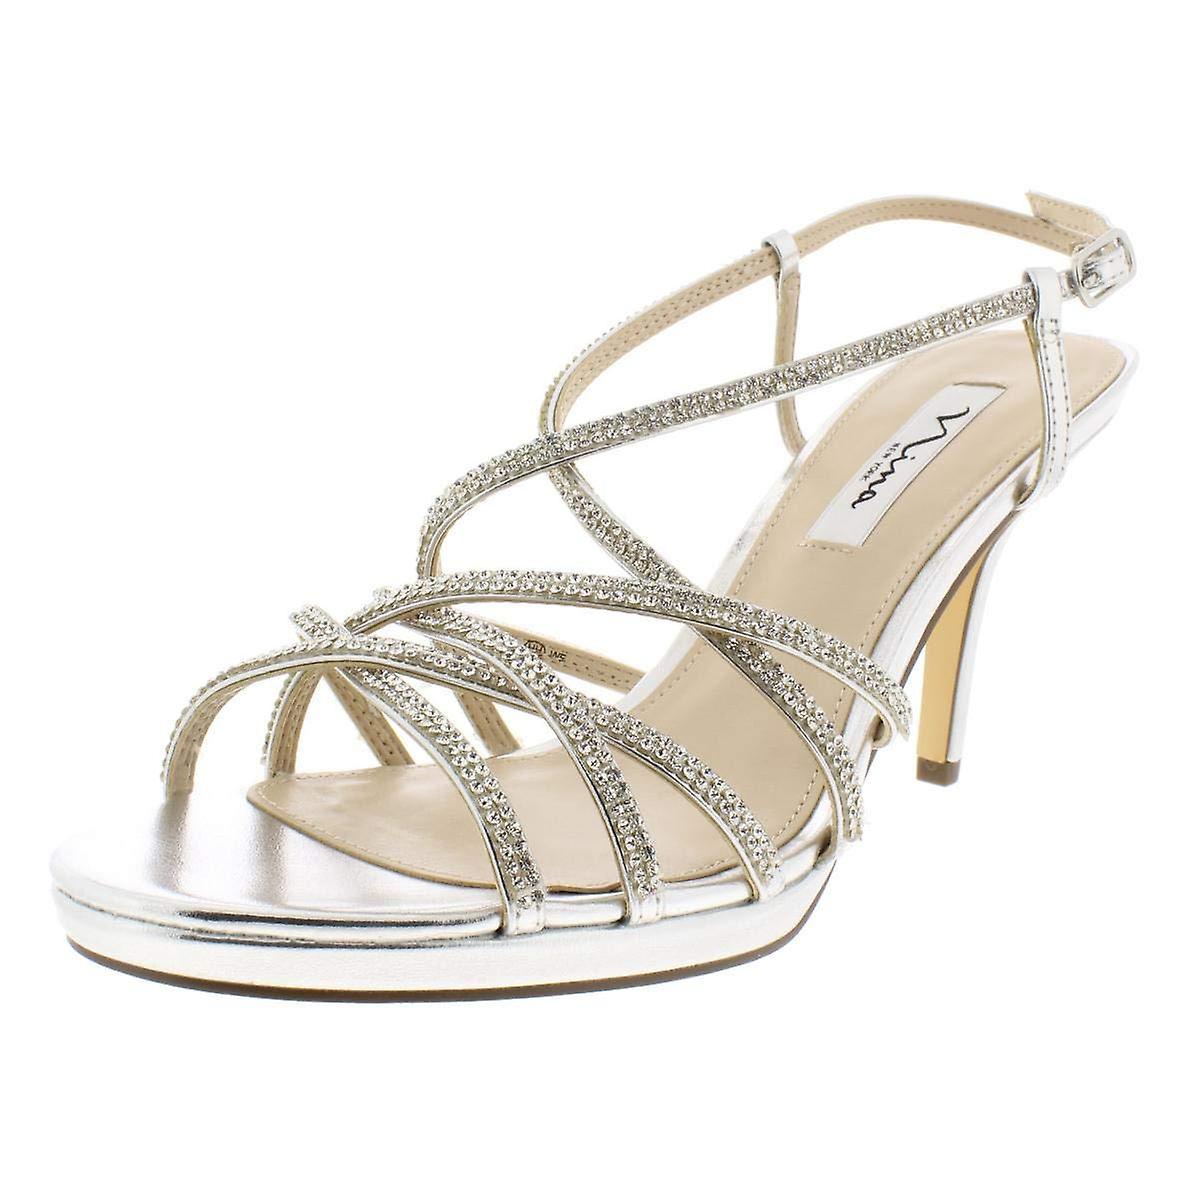 Nina Womens Vilma Open Toe Casual Strappy Sandals